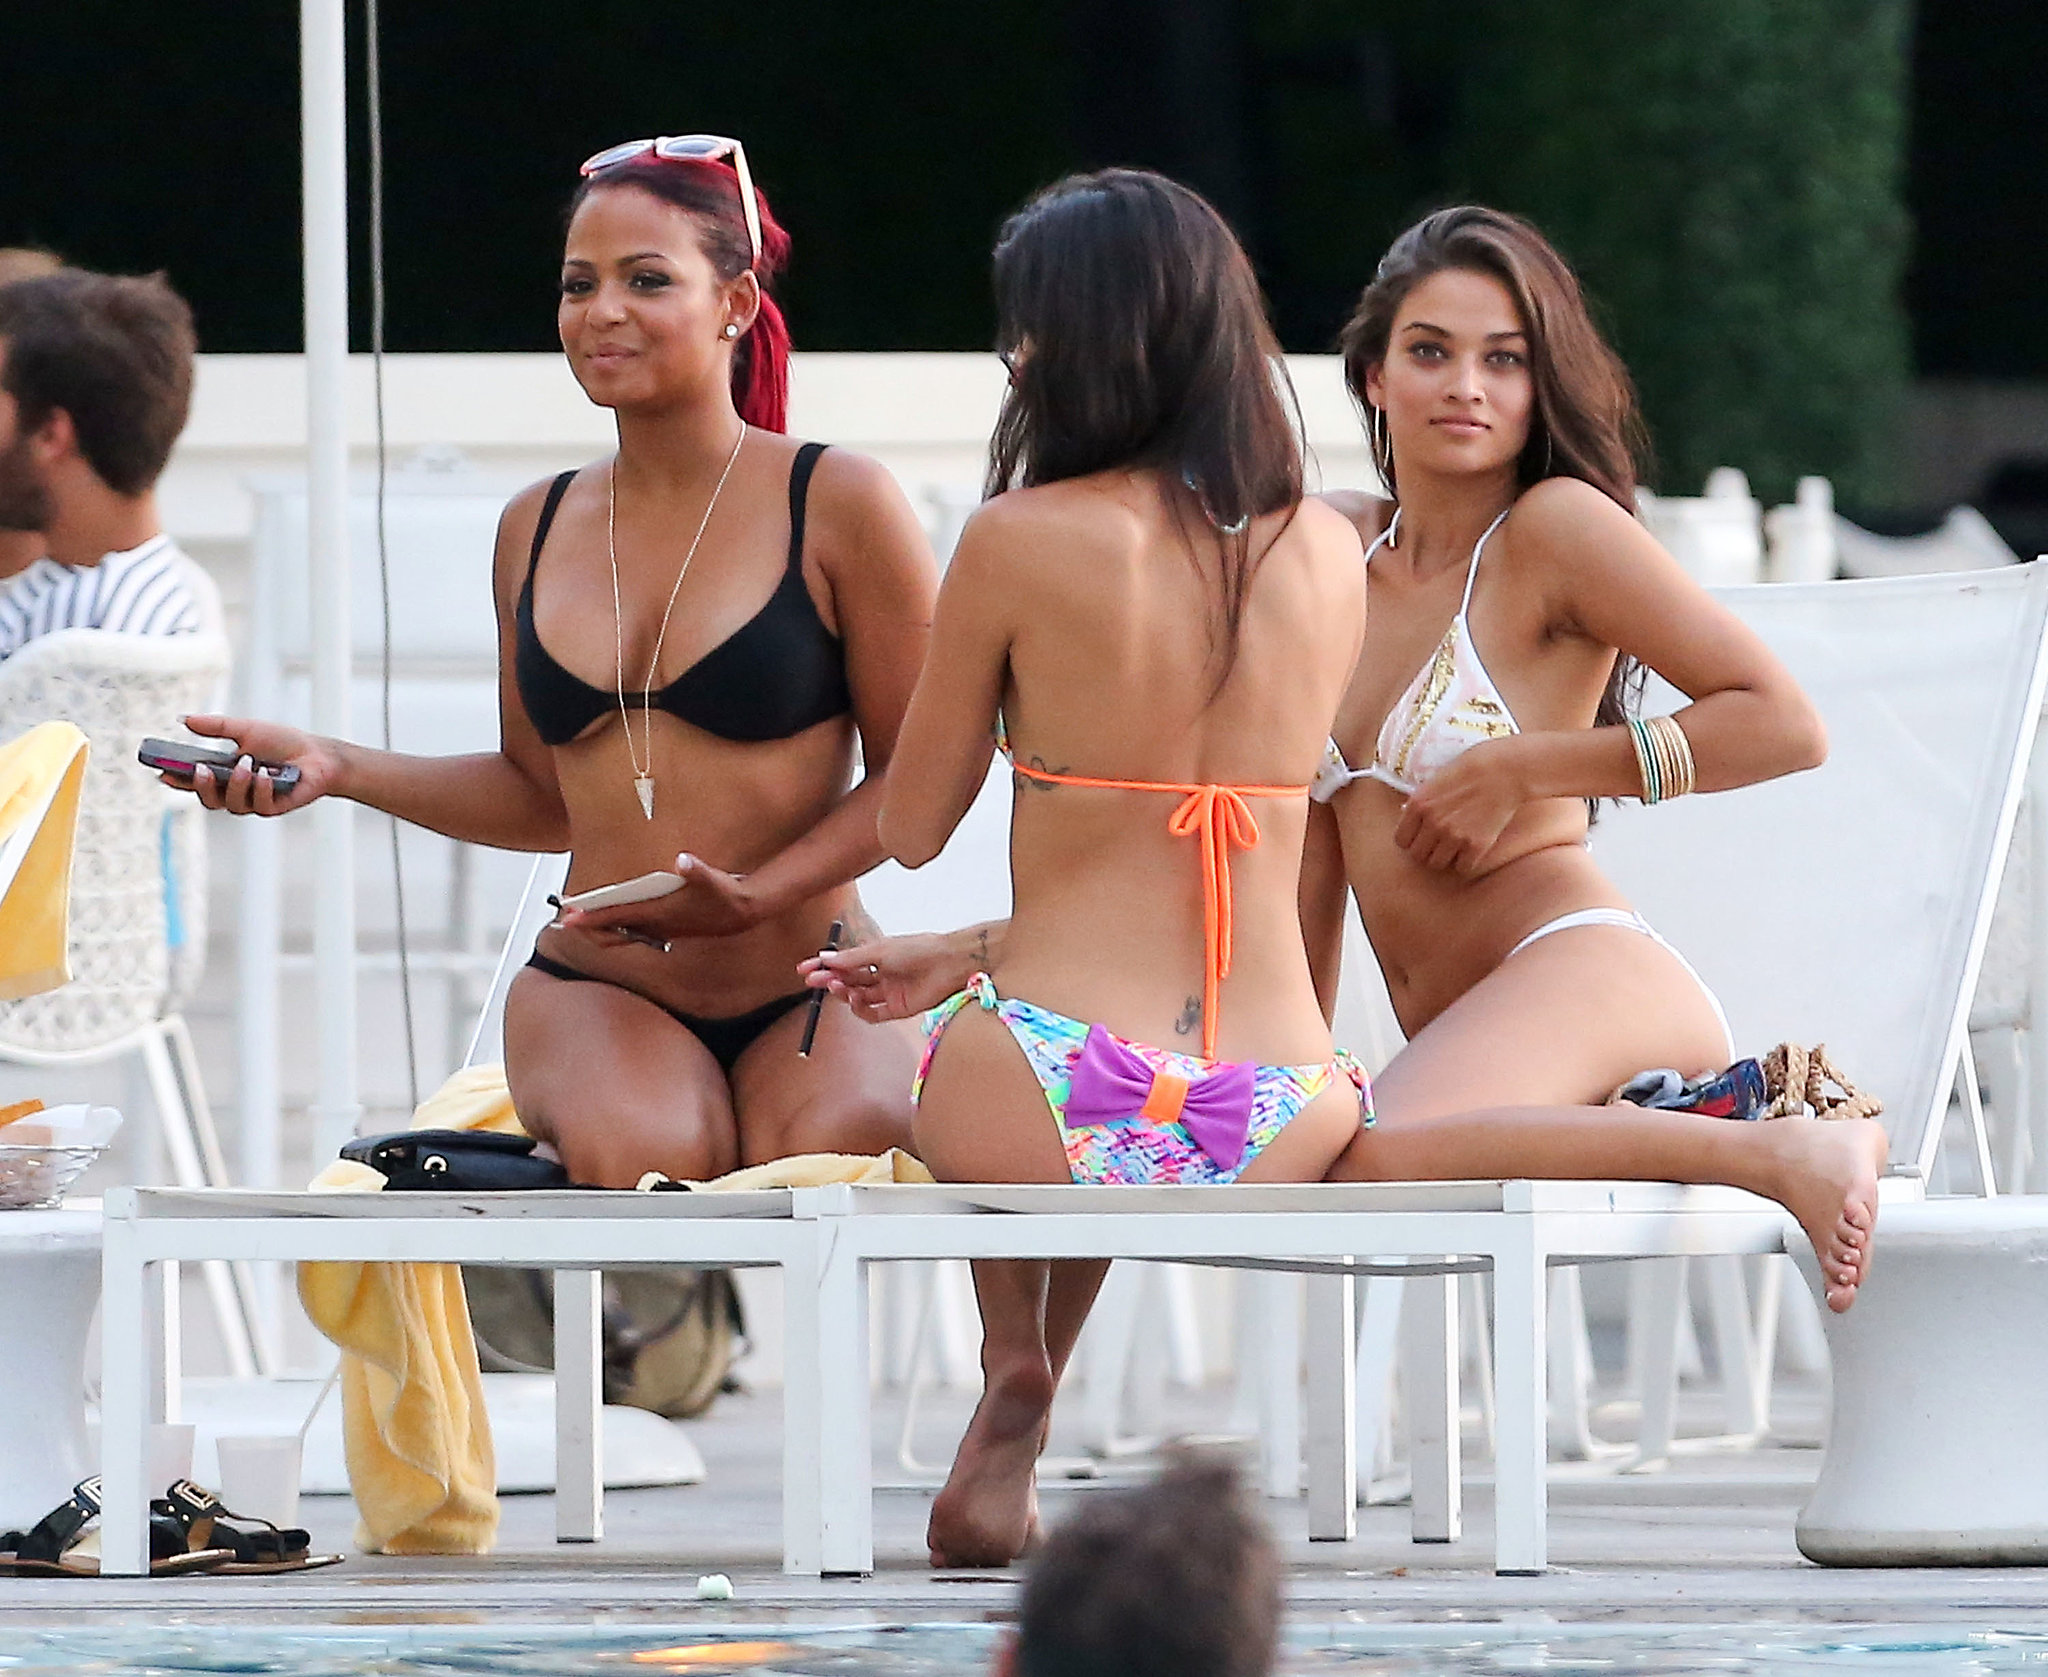 Christina Milian Rocks a Bikini and Fishnets During a Miami Pool Stop